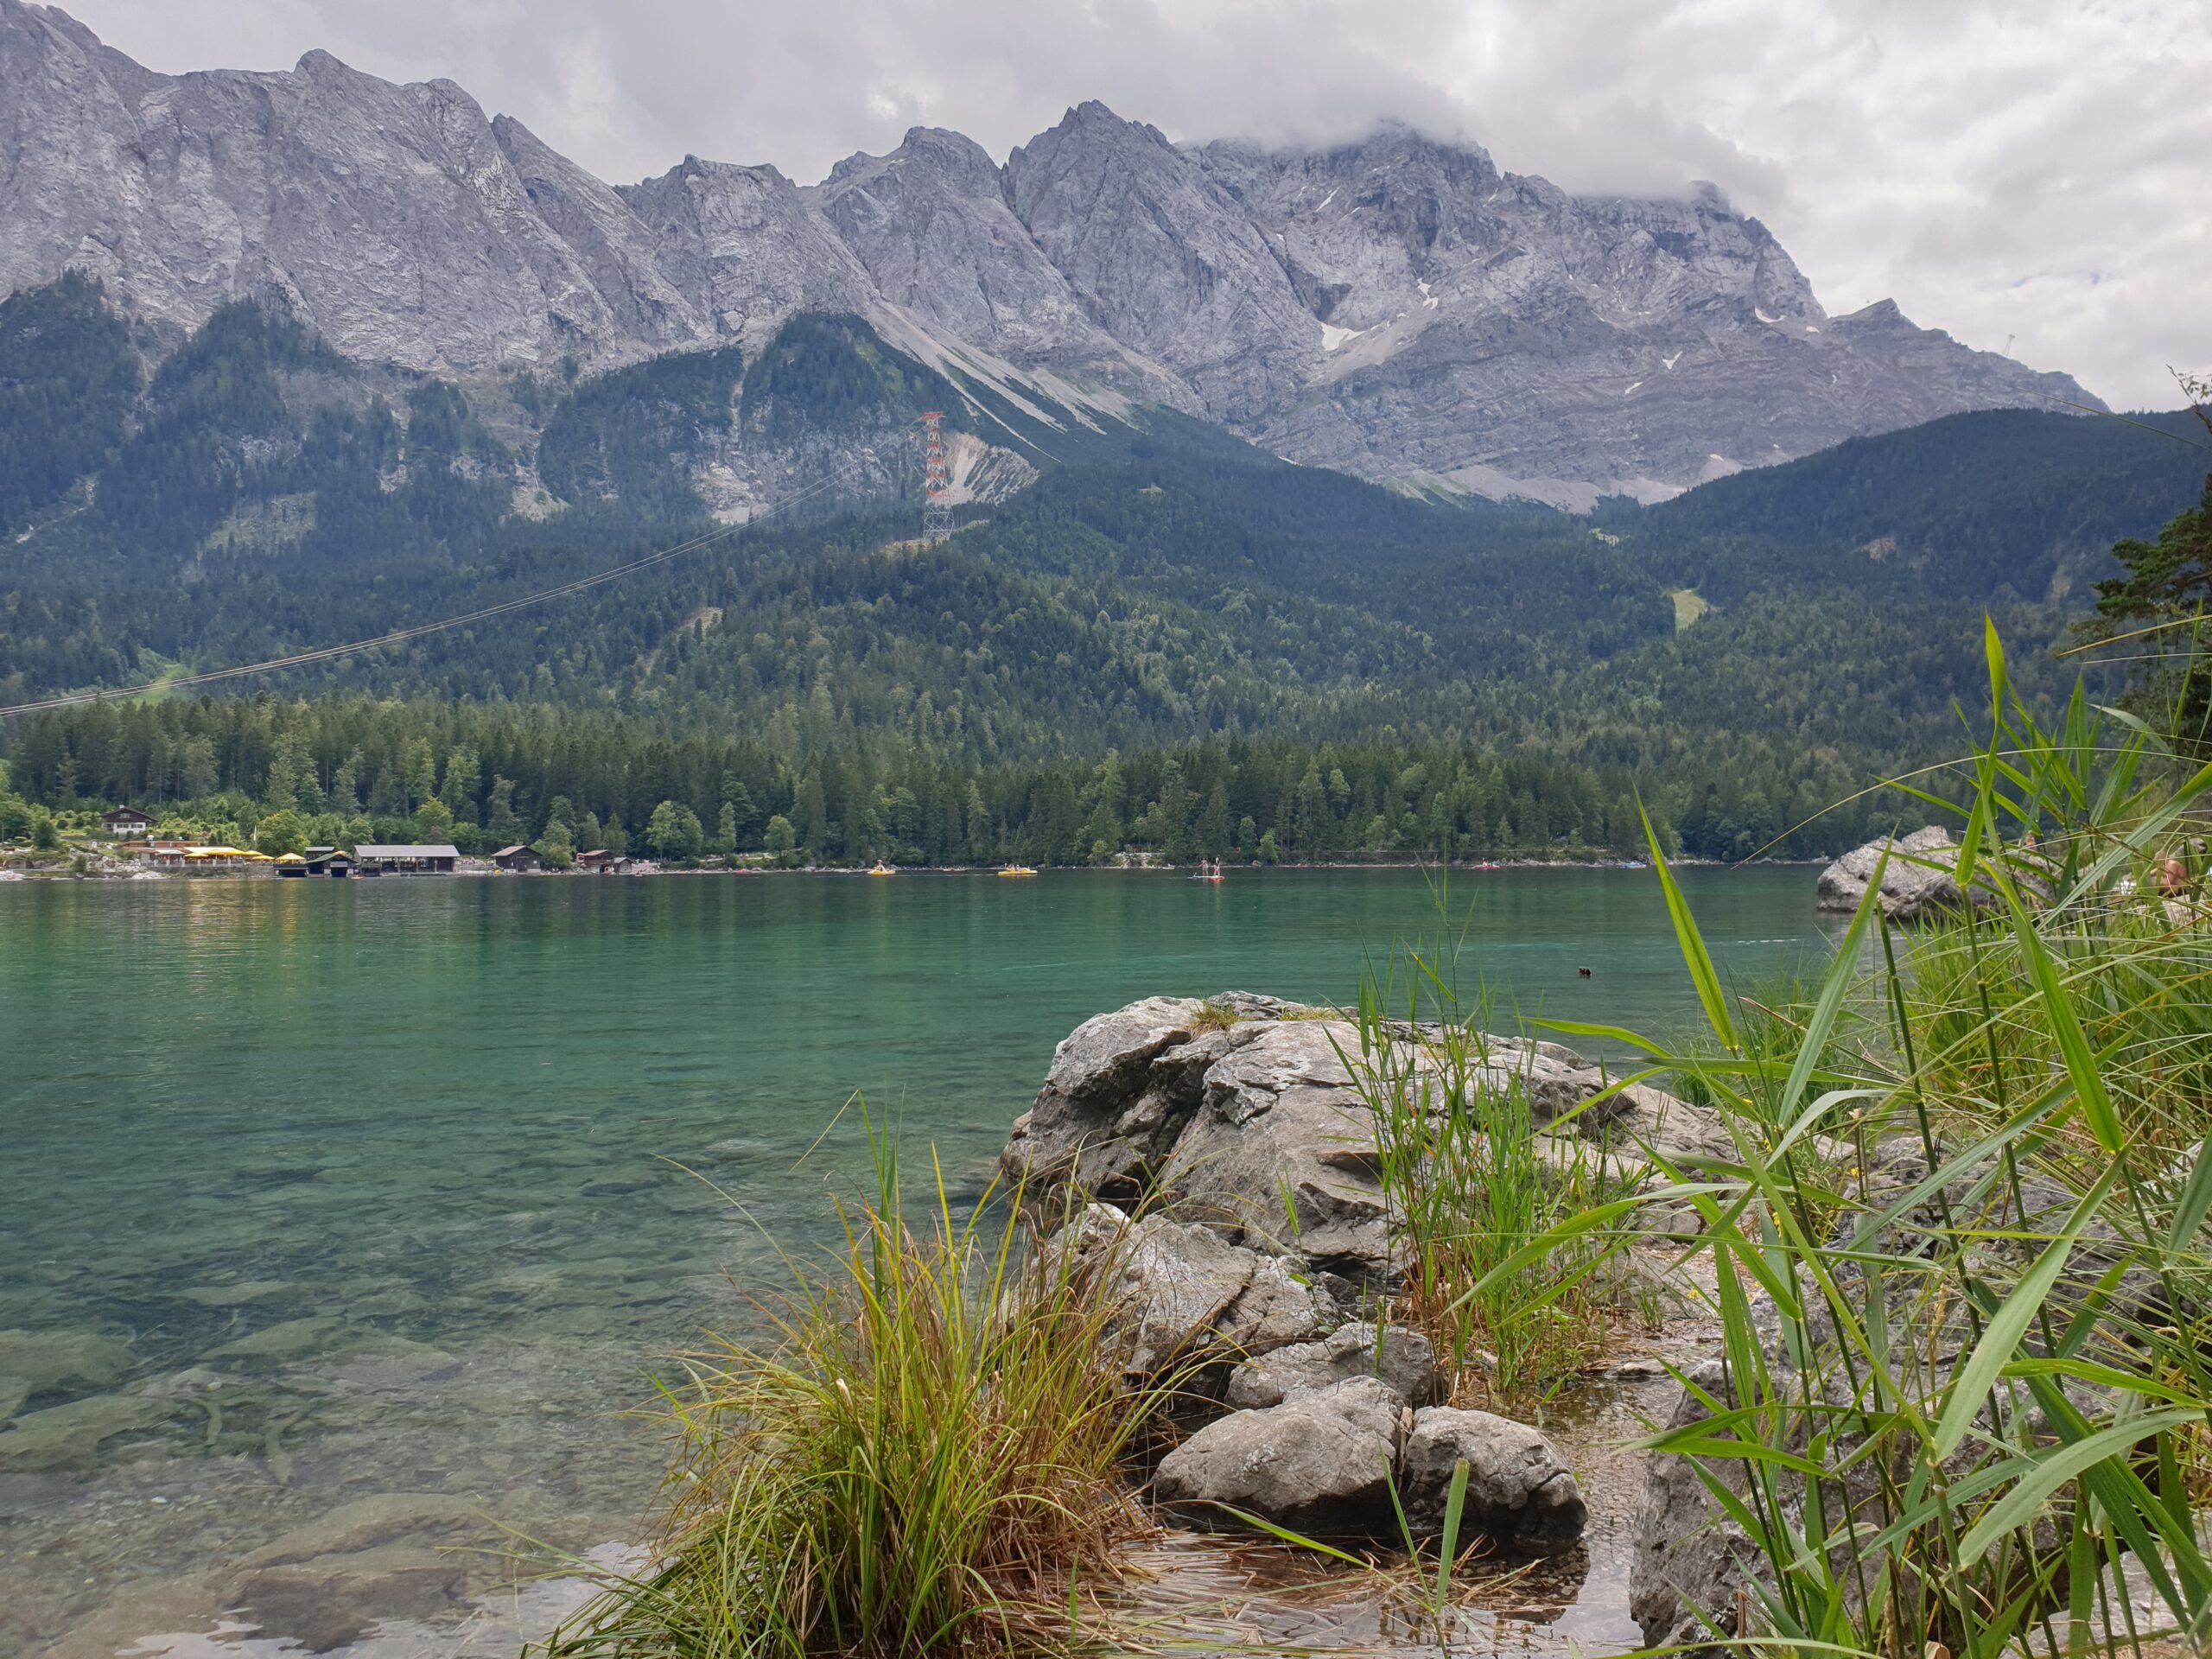 De Alpenroute in Duitsland: 4x hoogtepunten